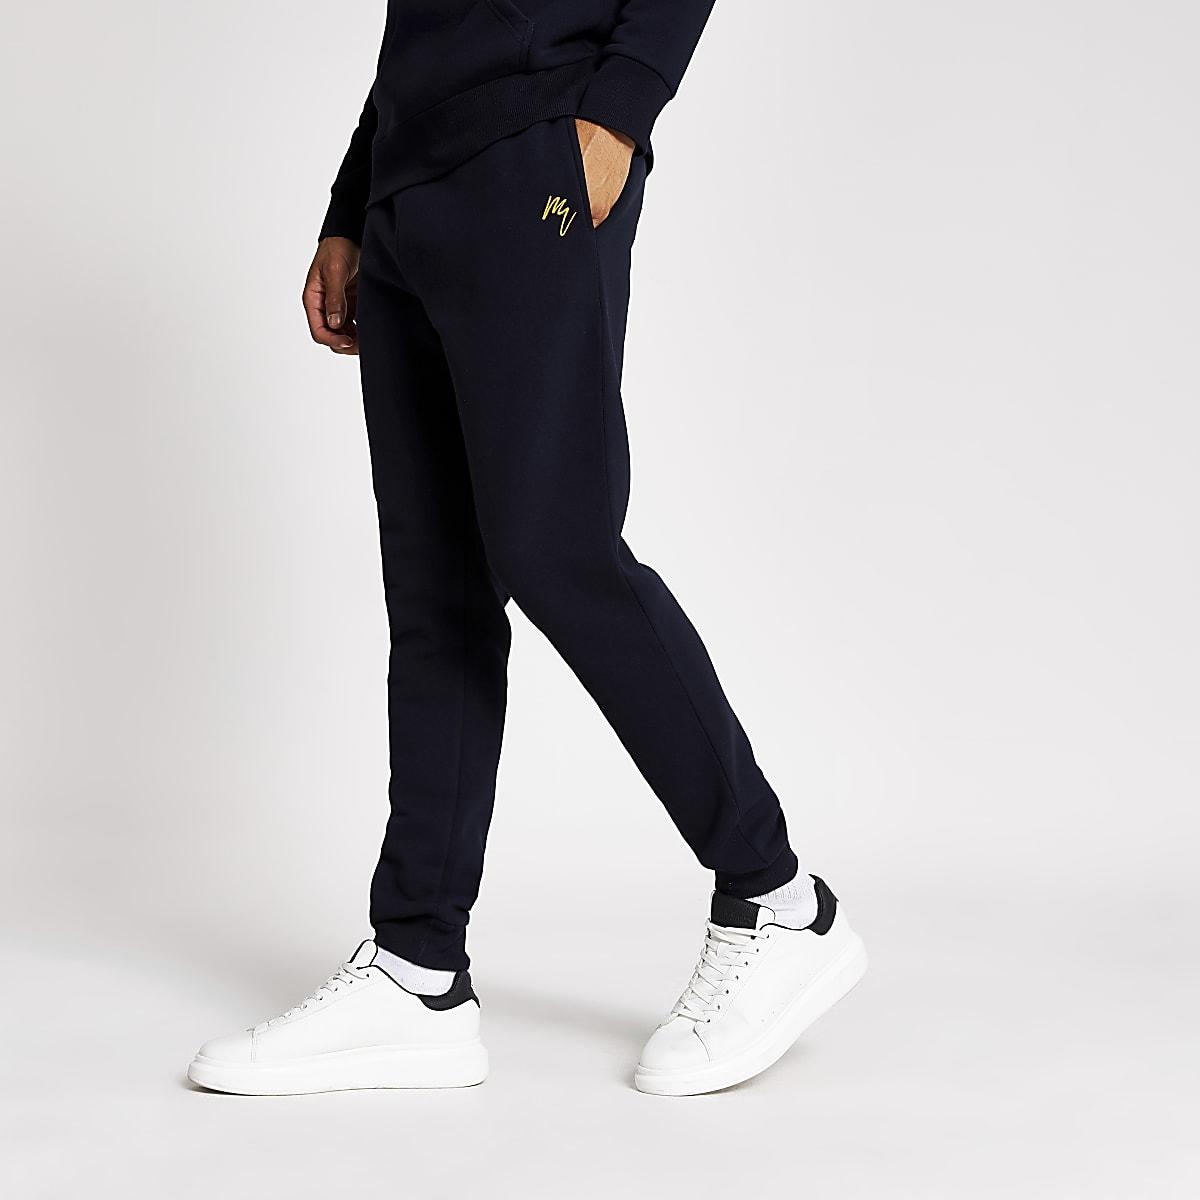 Maison Riviera – Pantalons de joggingajustés bleu marine